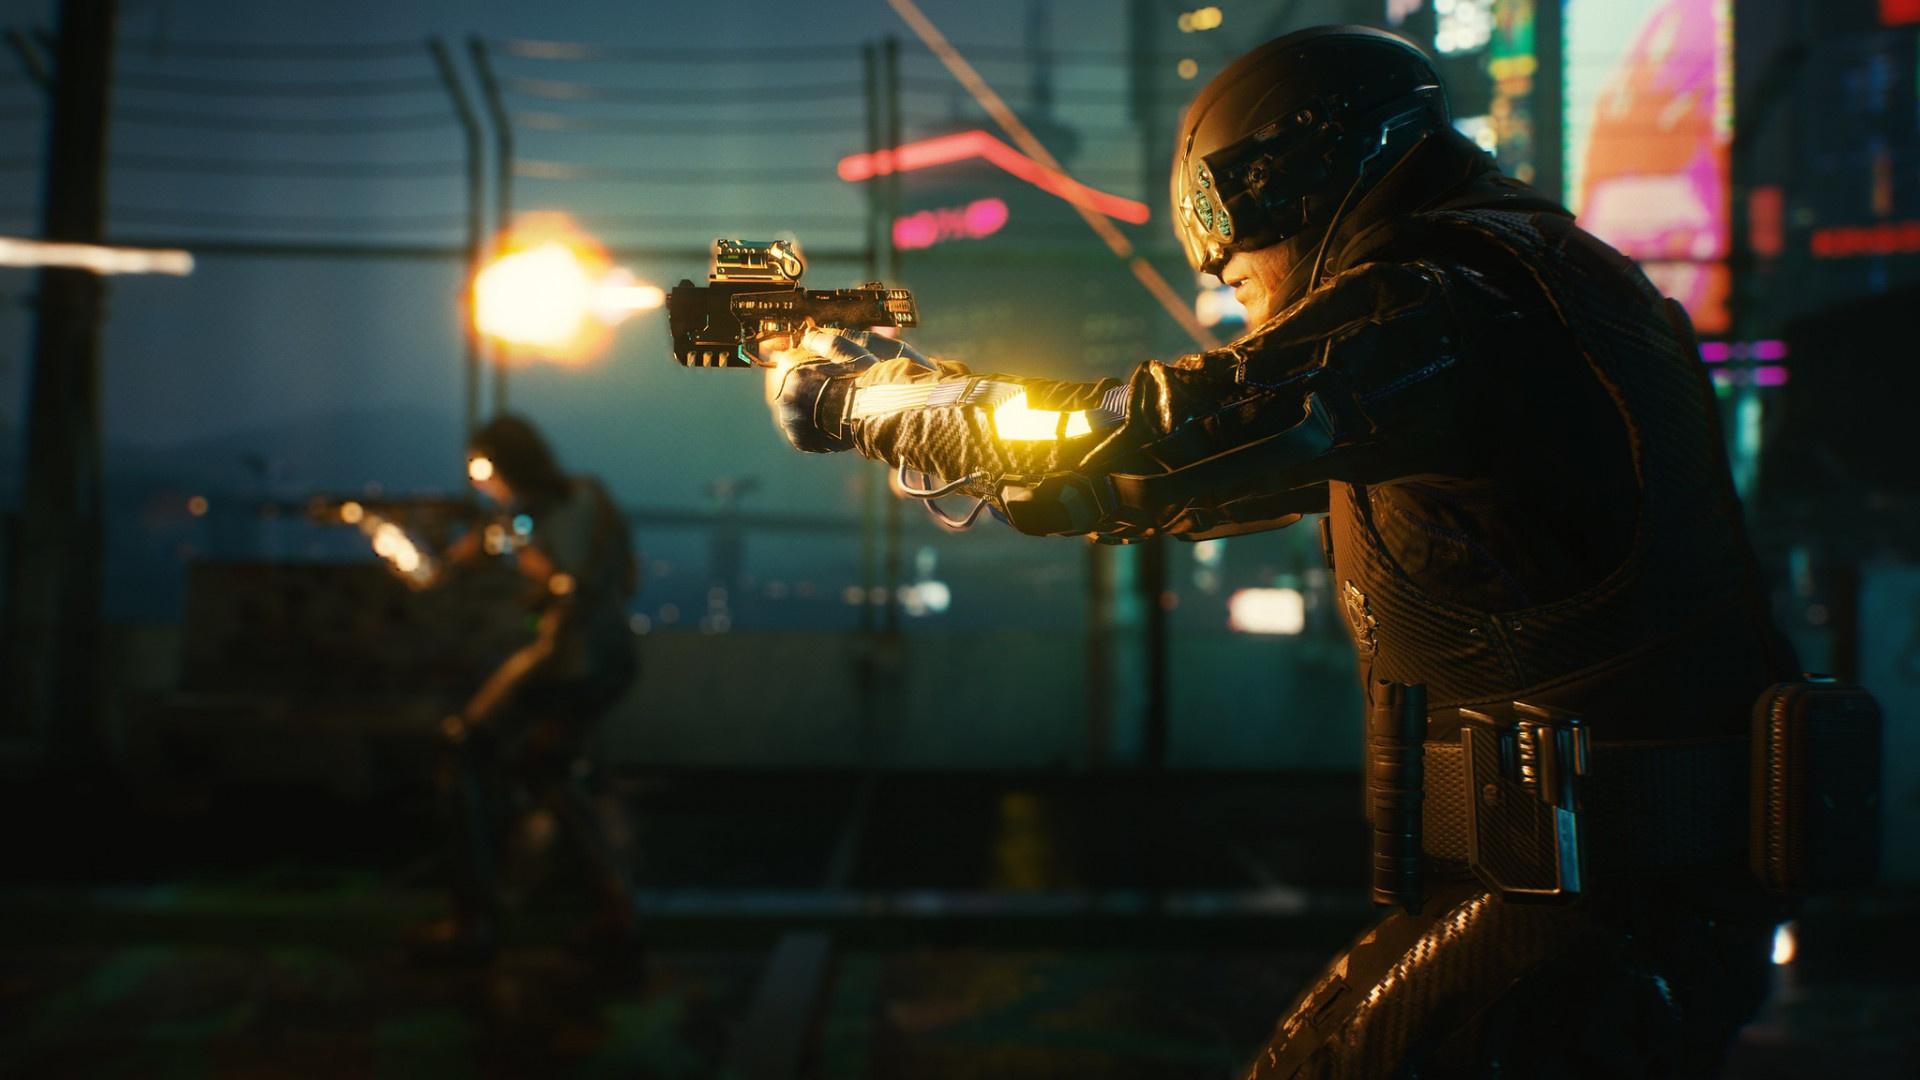 RTX On:9 скриншотов Cyberpunk 2077 с трассировкой лучей от NVIDIA